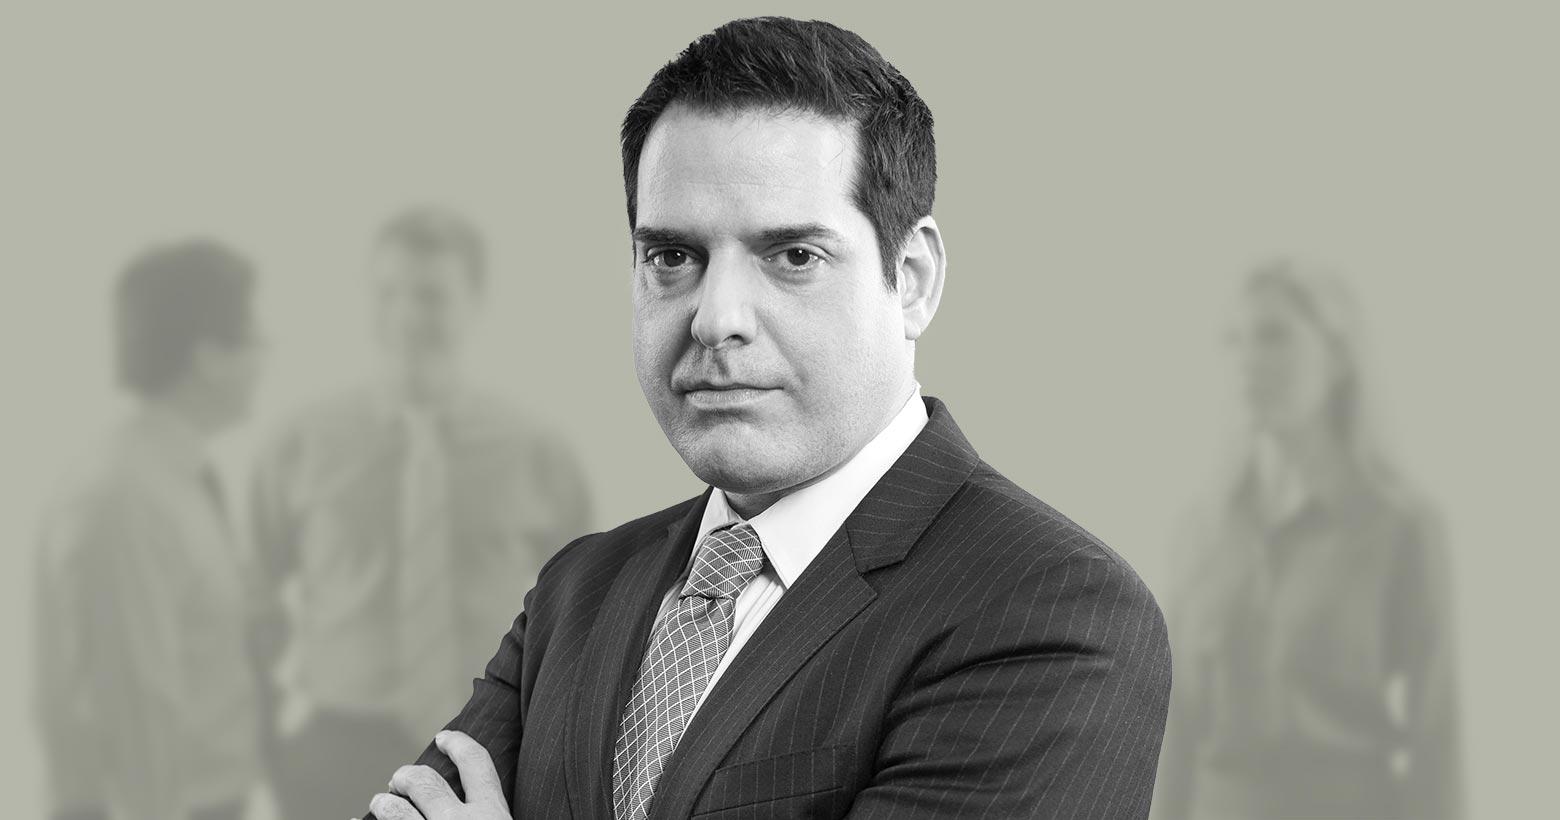 David Azcue